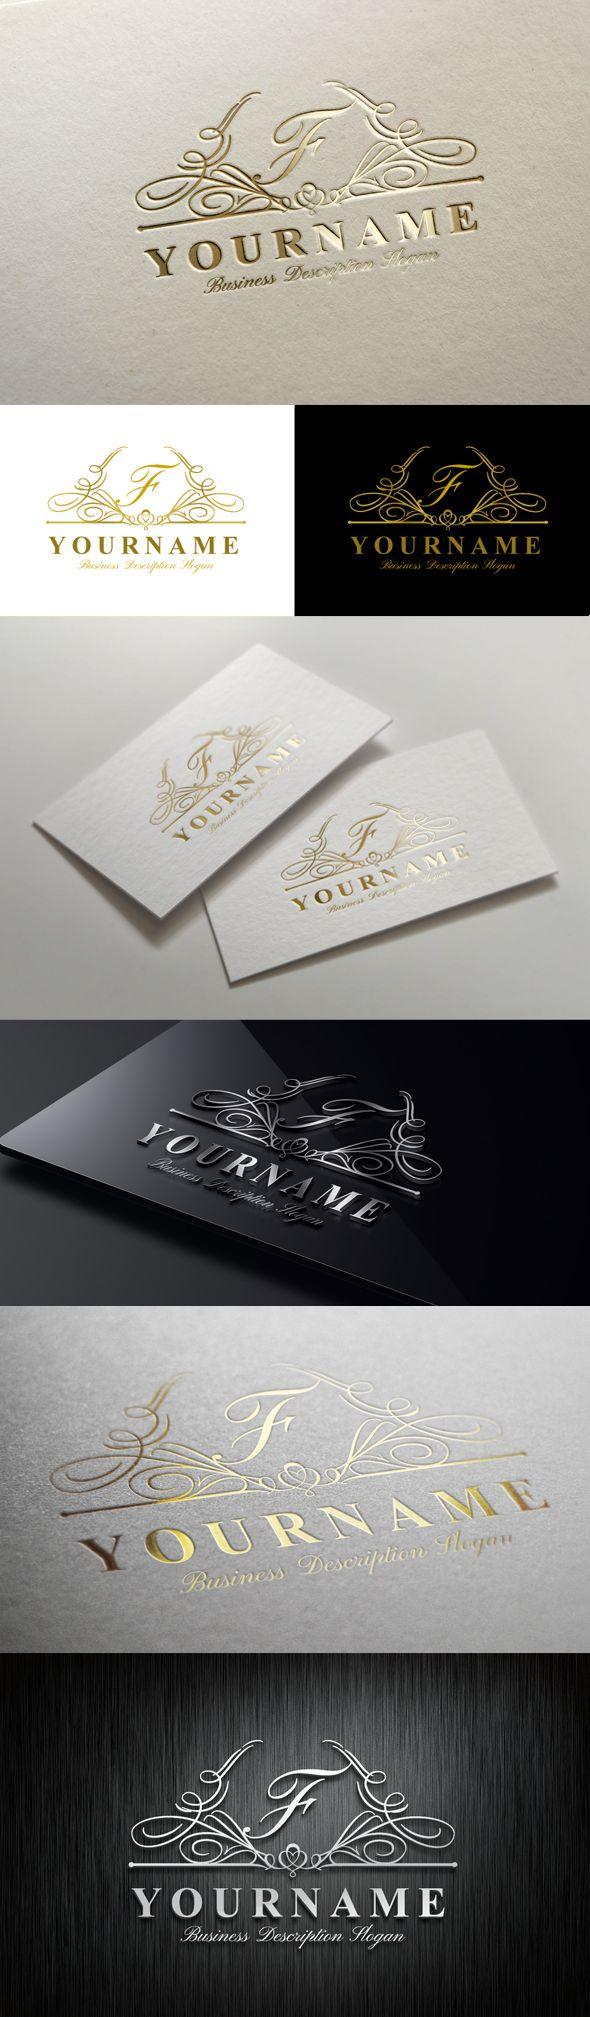 Create your own designs amp sell your design online shirts zazzle - Free Logos Maker Online Create Vintage Logo Design Maker